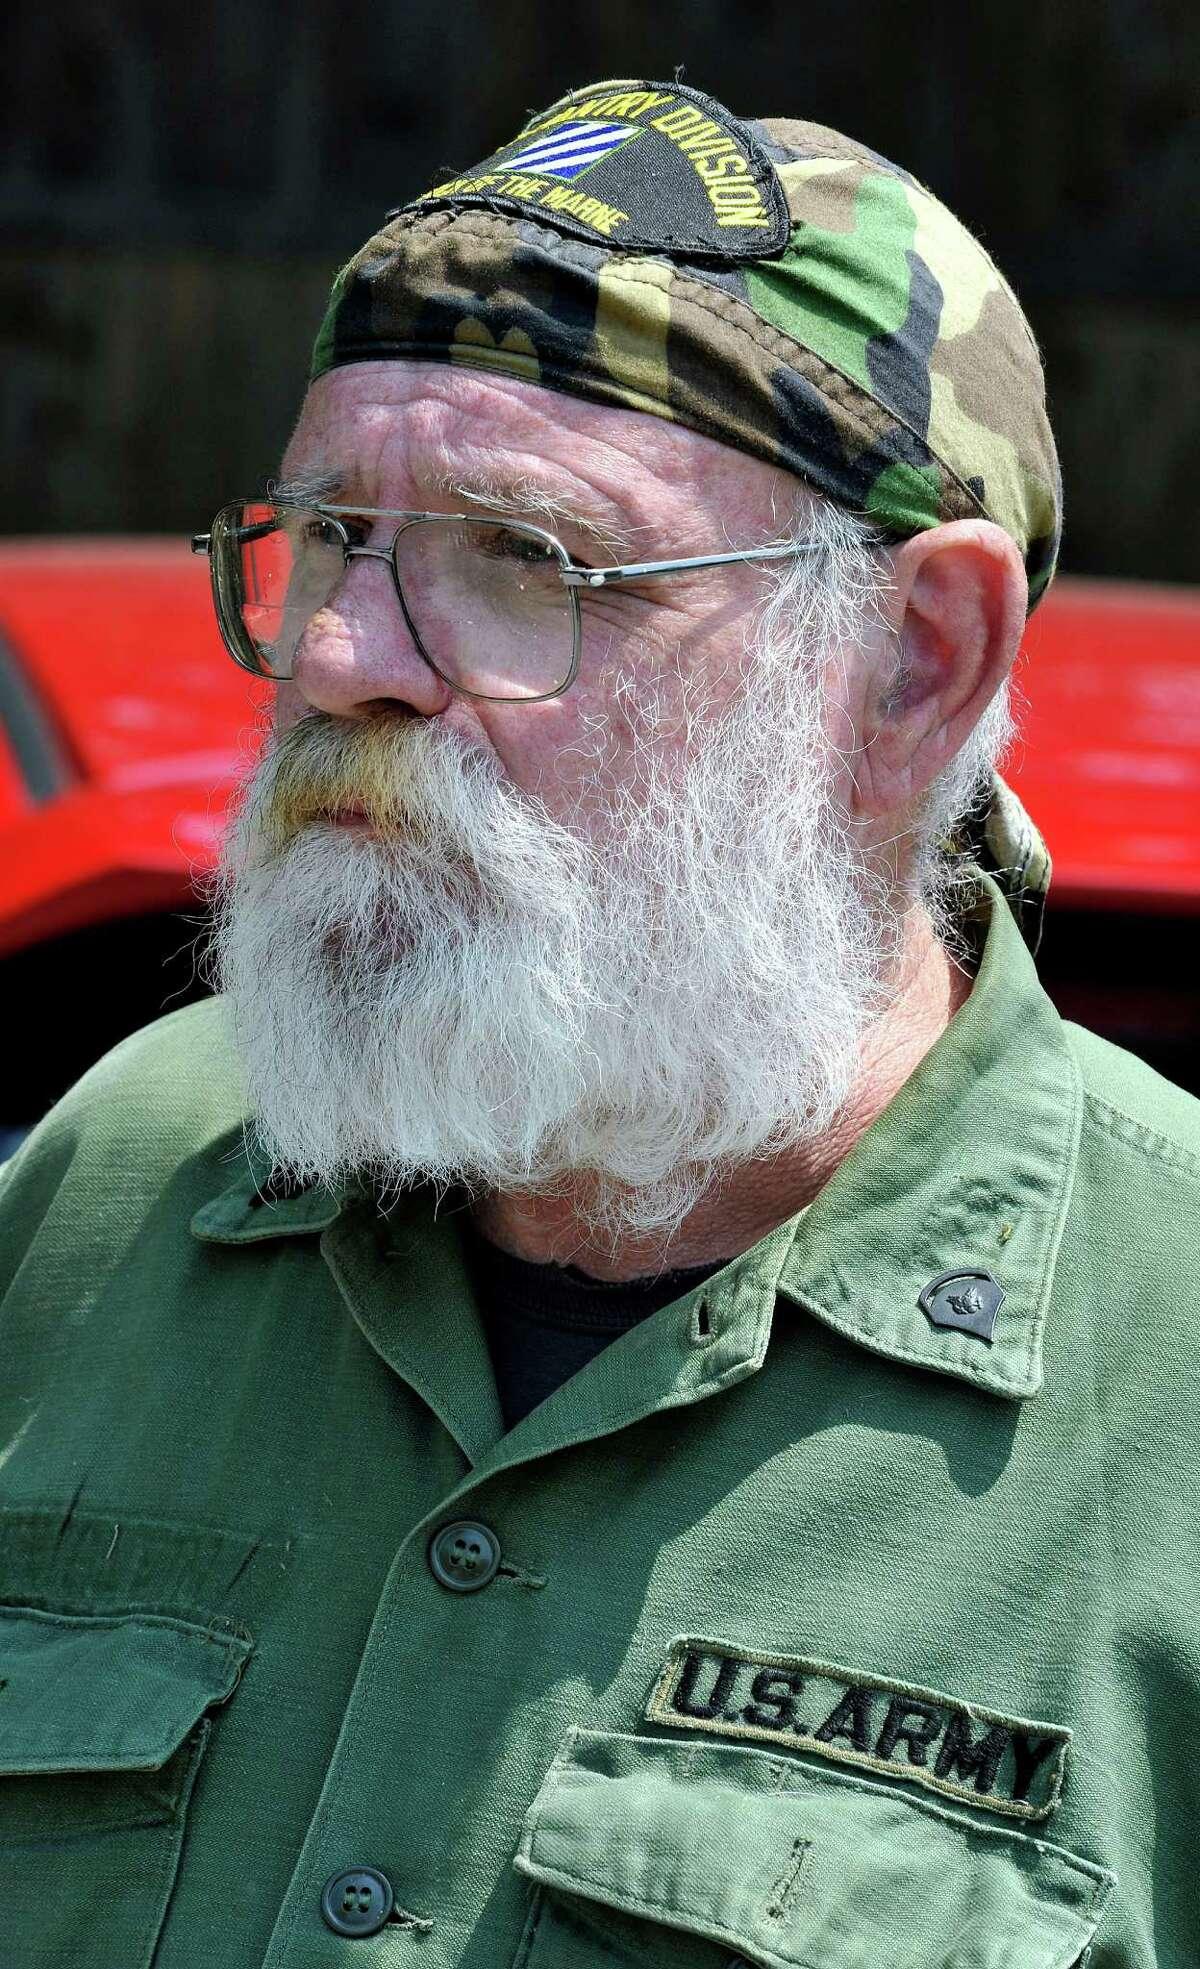 Bob Hansen is a Vietnam War veteran and took part in the Redding Memorial Day Parade Saturday, May 26, 2012.